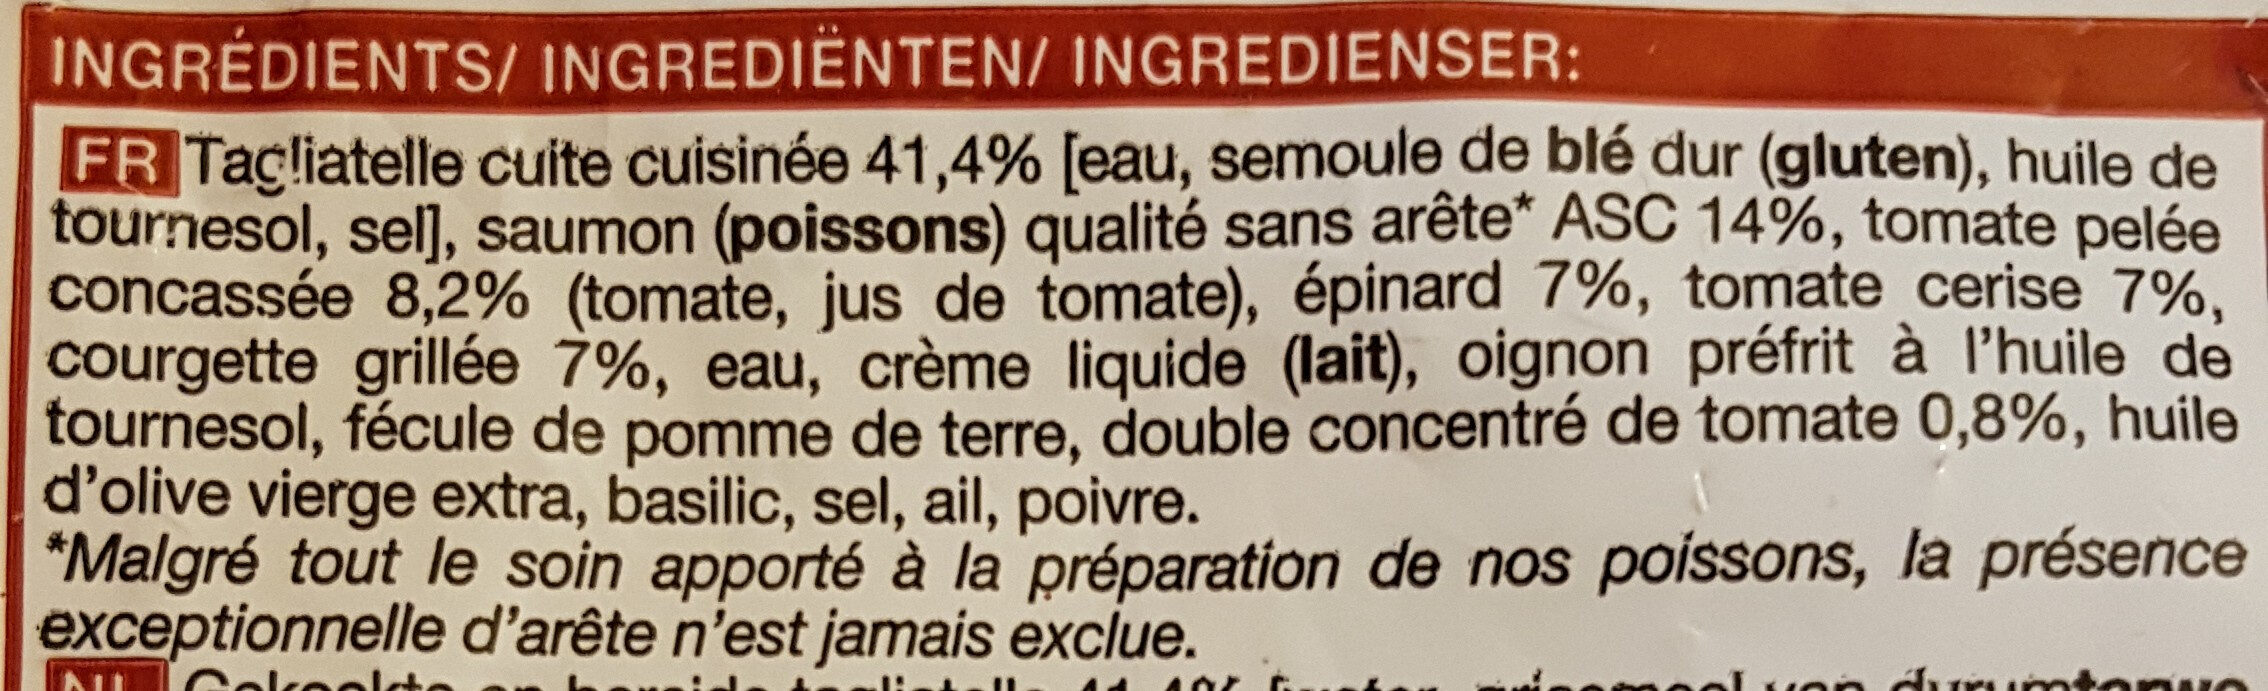 Tagliatelles au saumon sauce tomatée, légumes - Ingredienti - fr